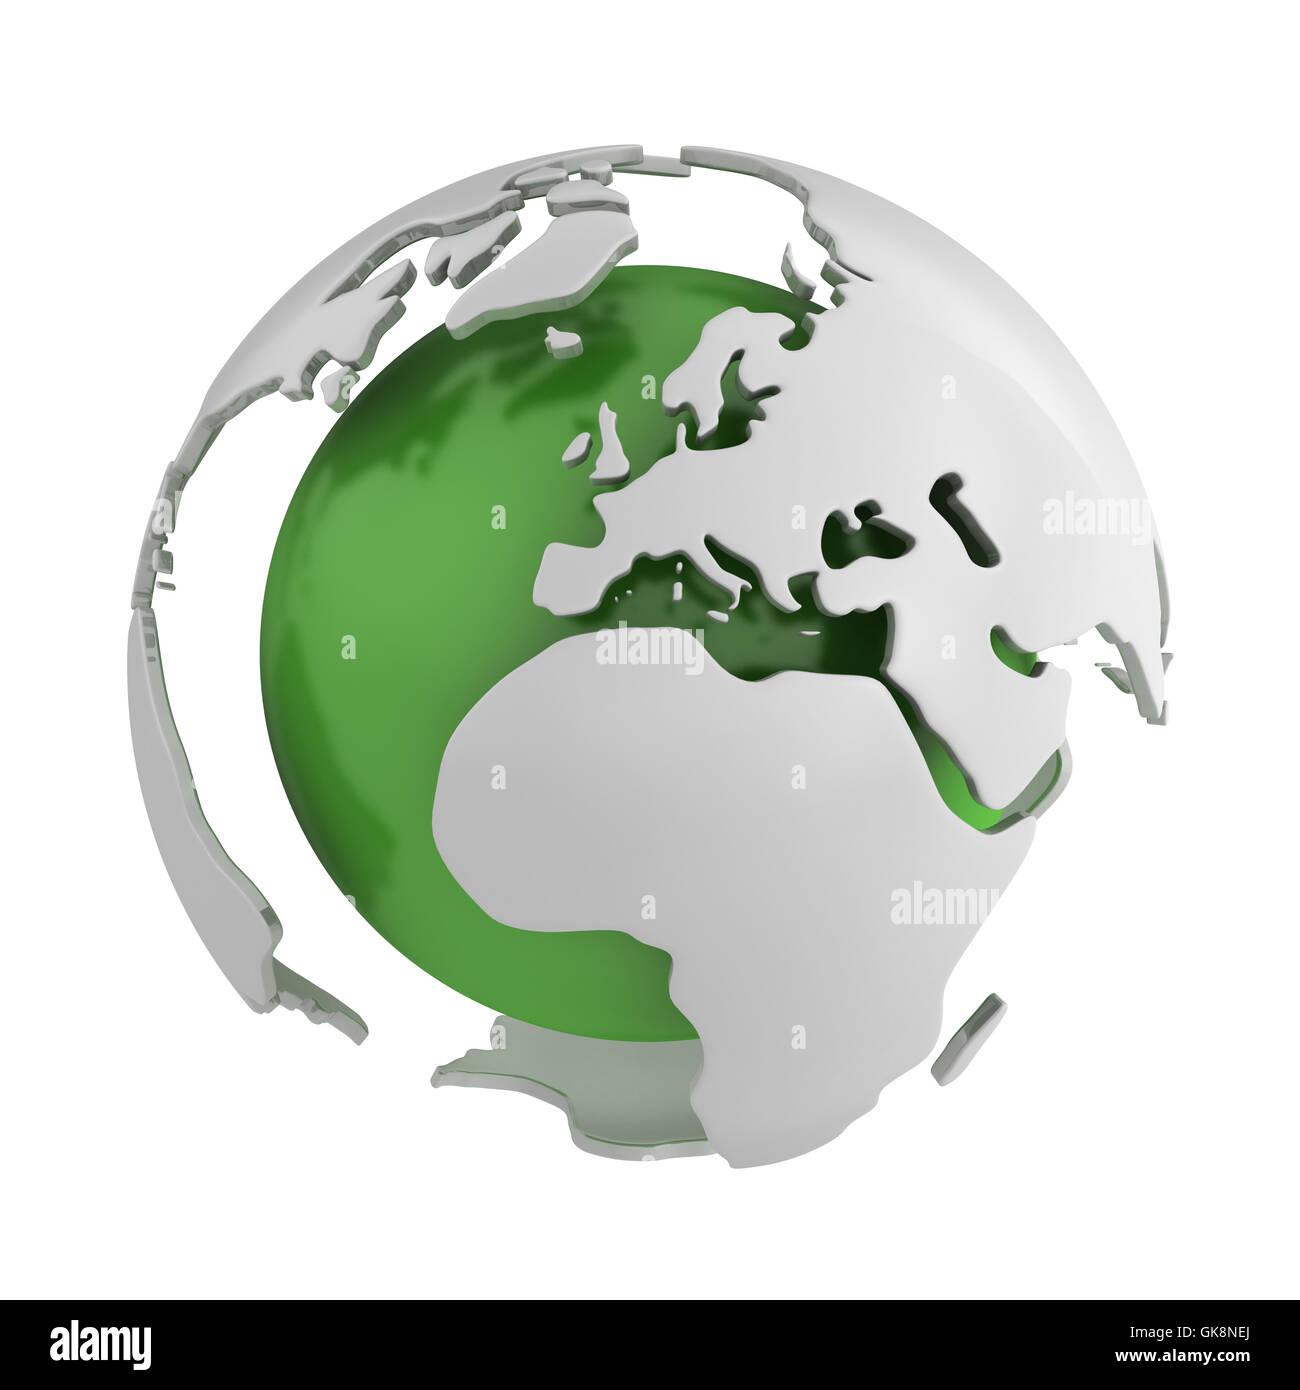 ball green ecology - Stock Image